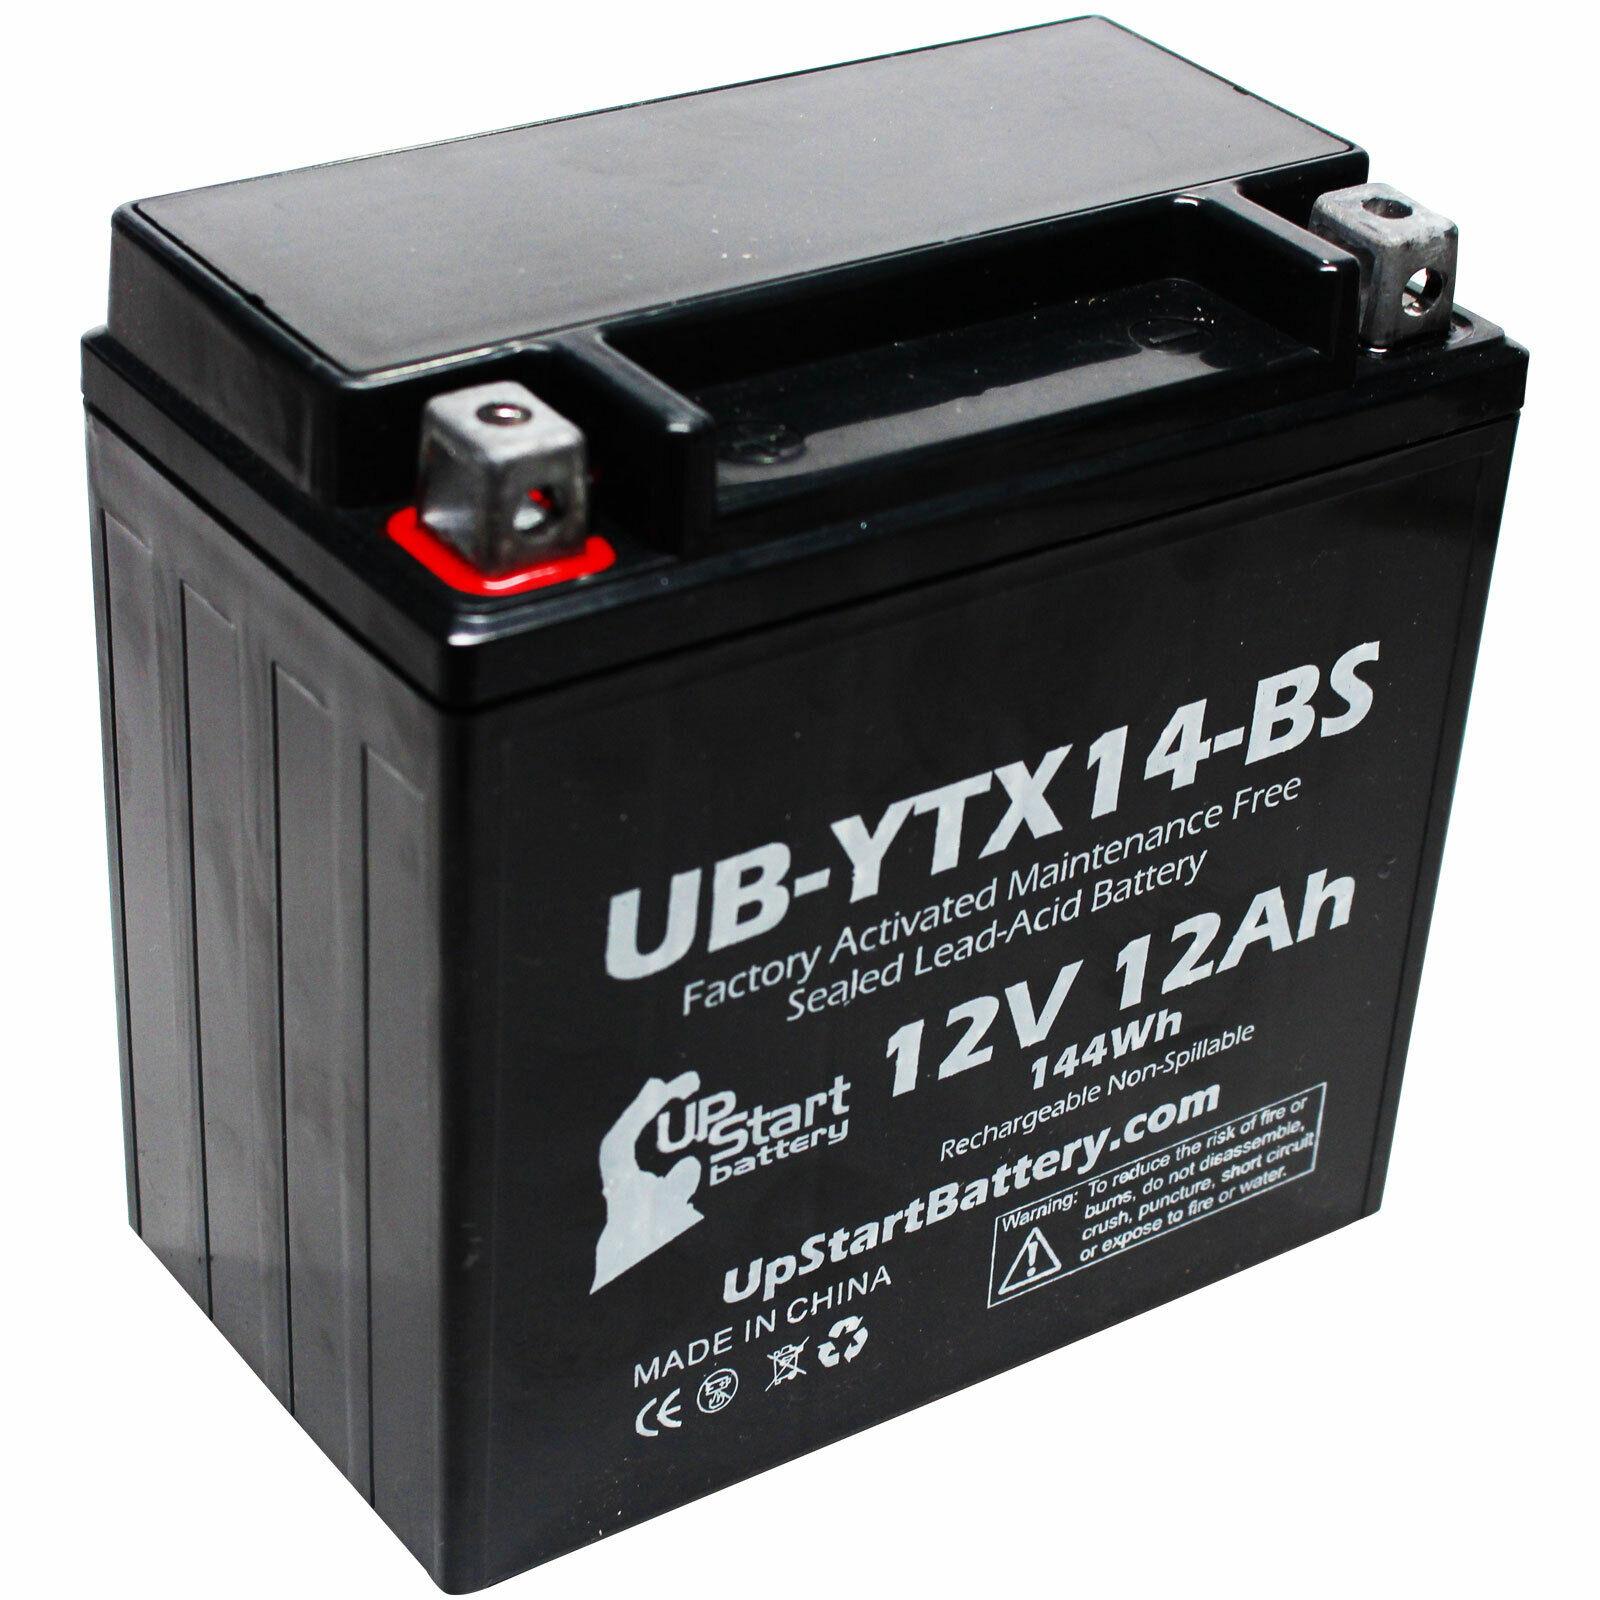 12V 12AH Battery for 2003 Honda TRX450 FourTrax Foreman S, ES 450 CC